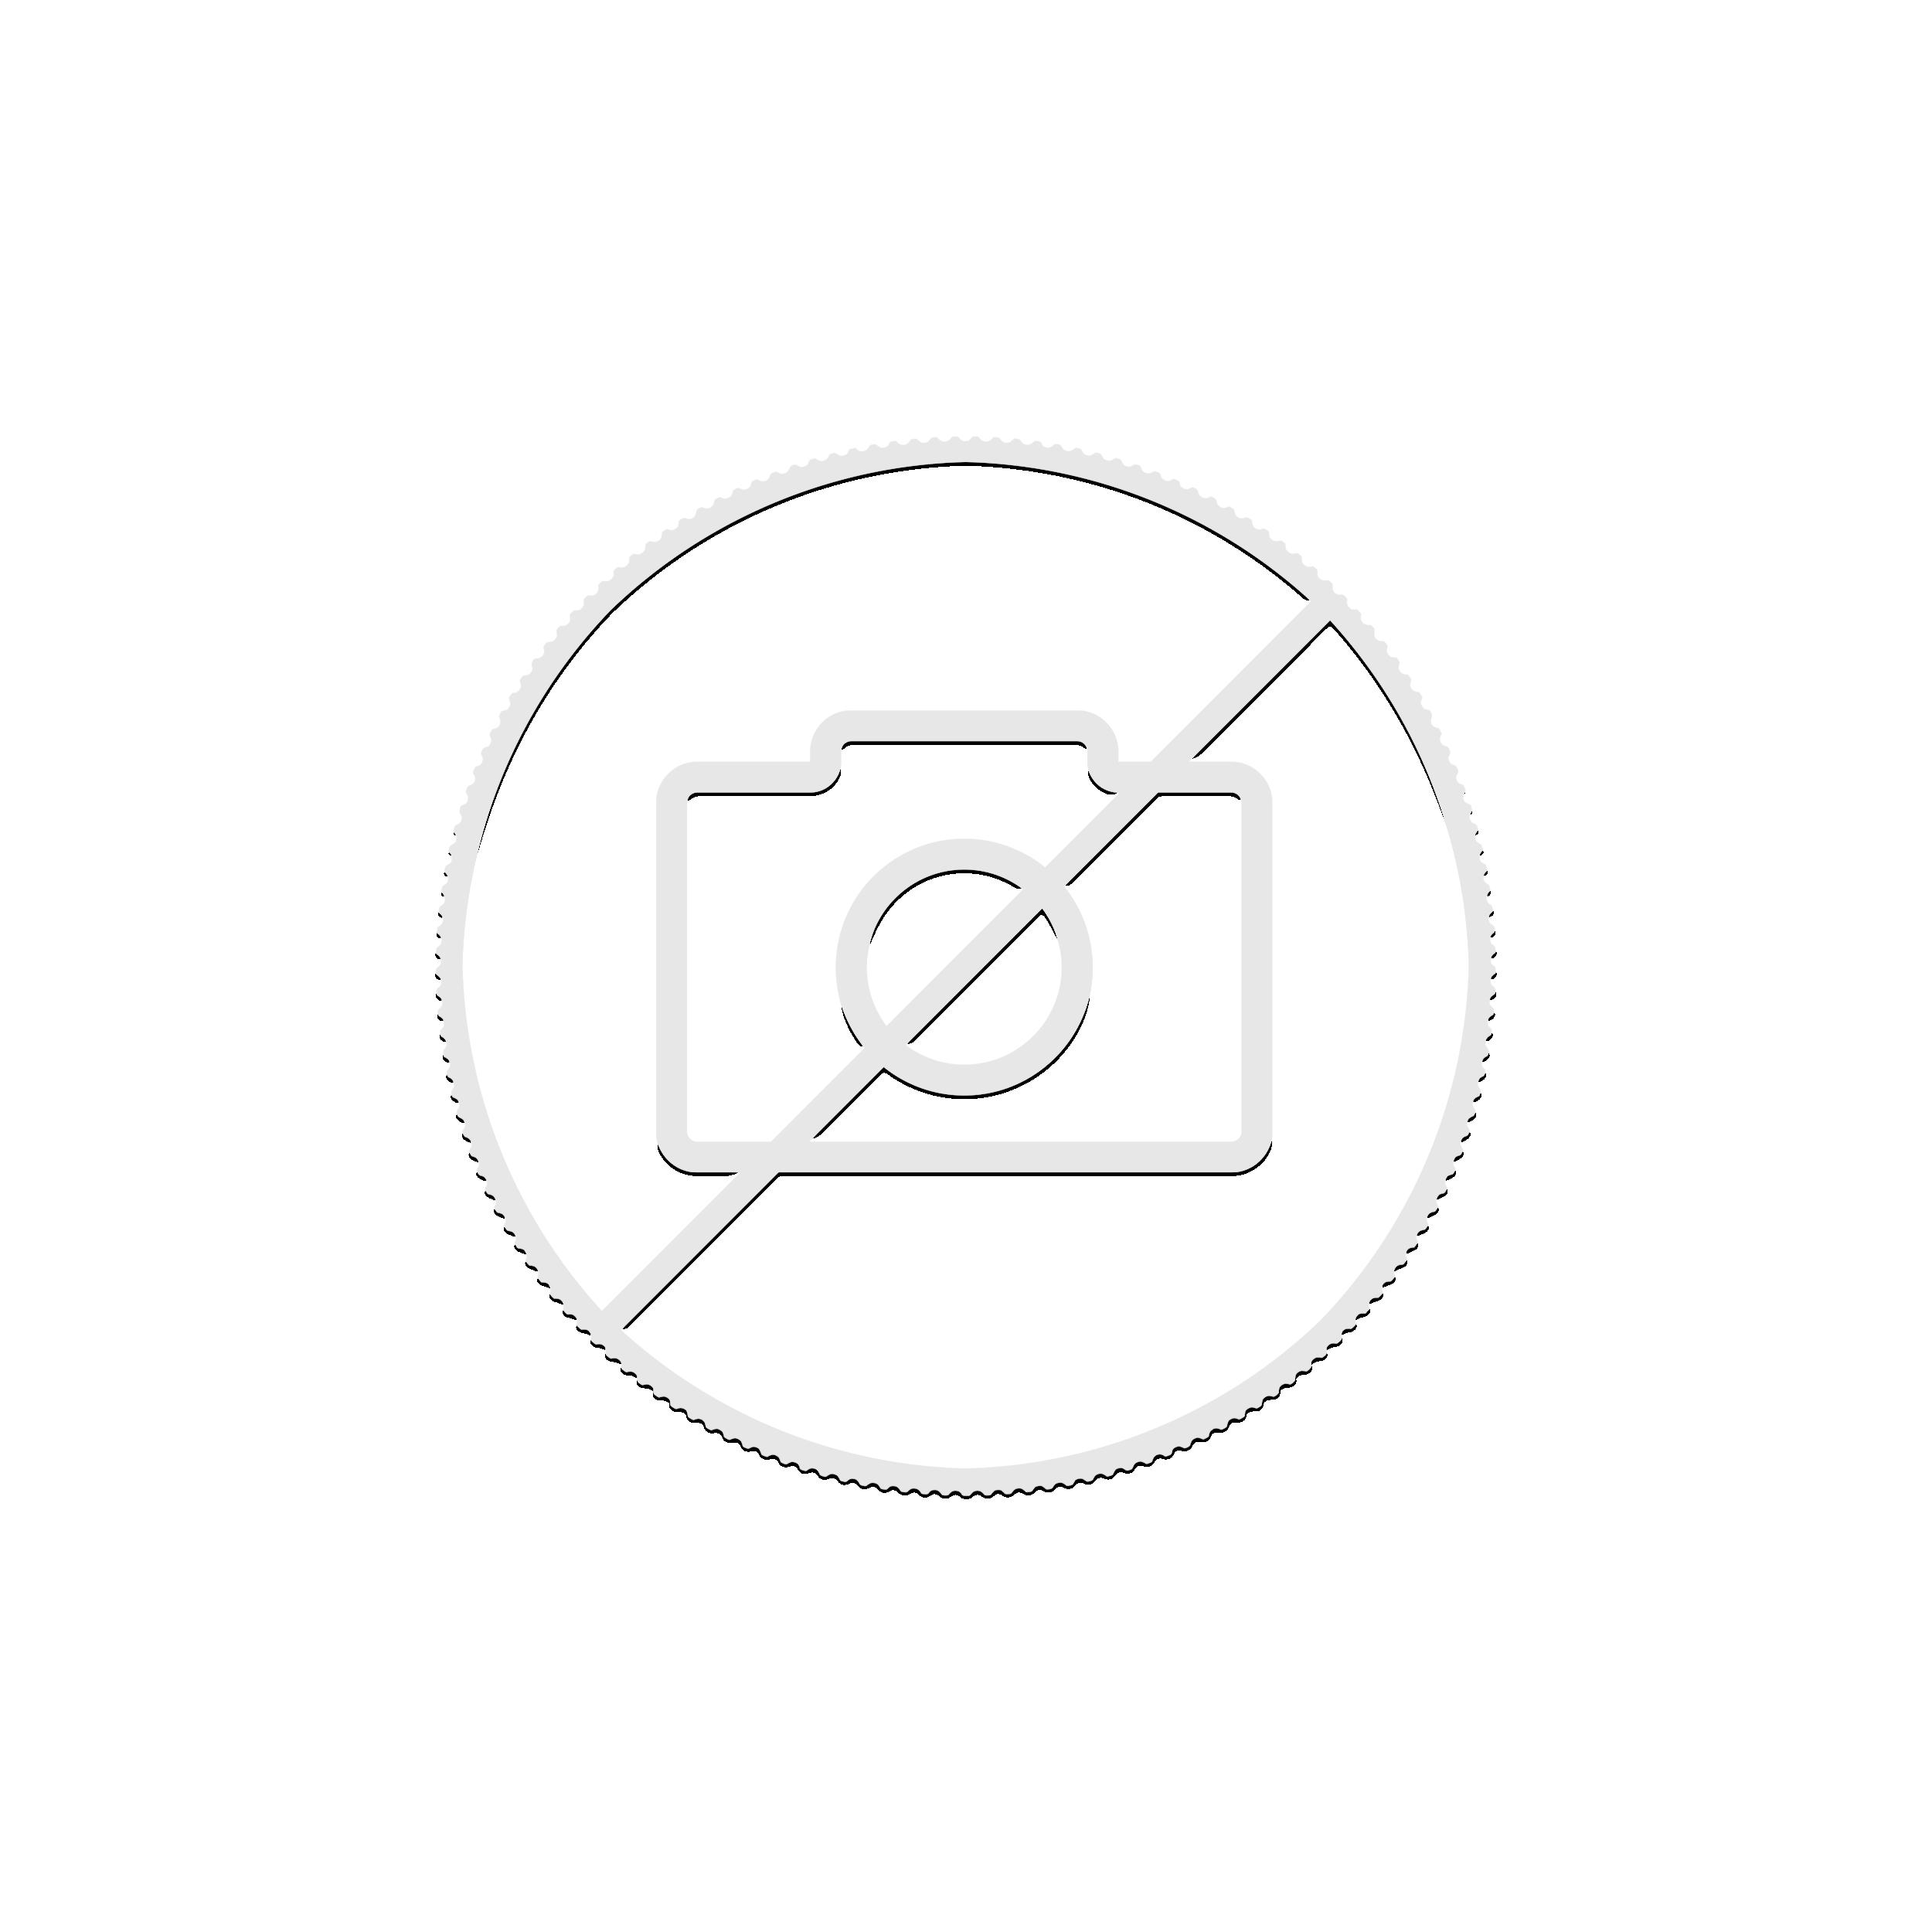 8 Gram gouden Panda munt 2017